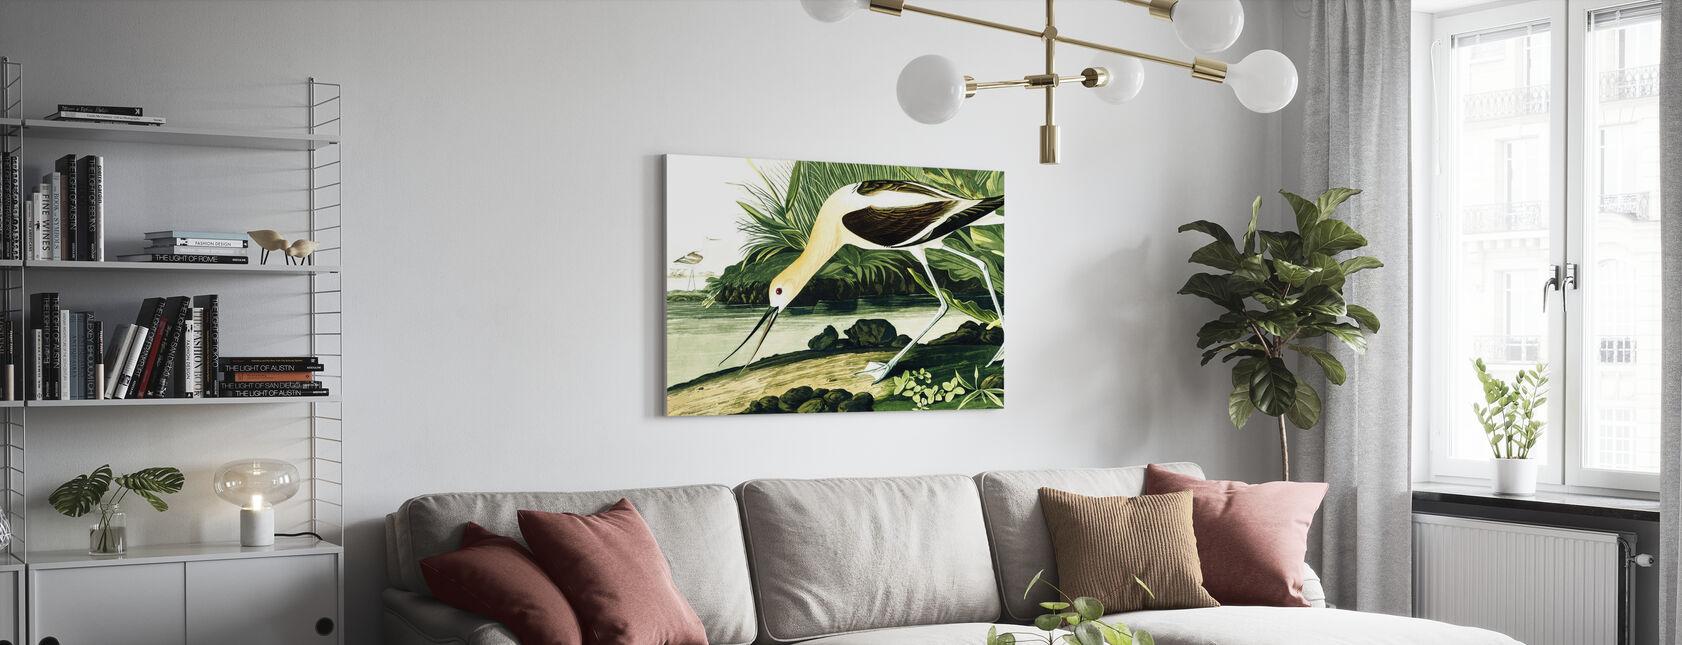 Jaskółka stodoła - John James Audubon - Obraz na płótnie - Pokój dzienny